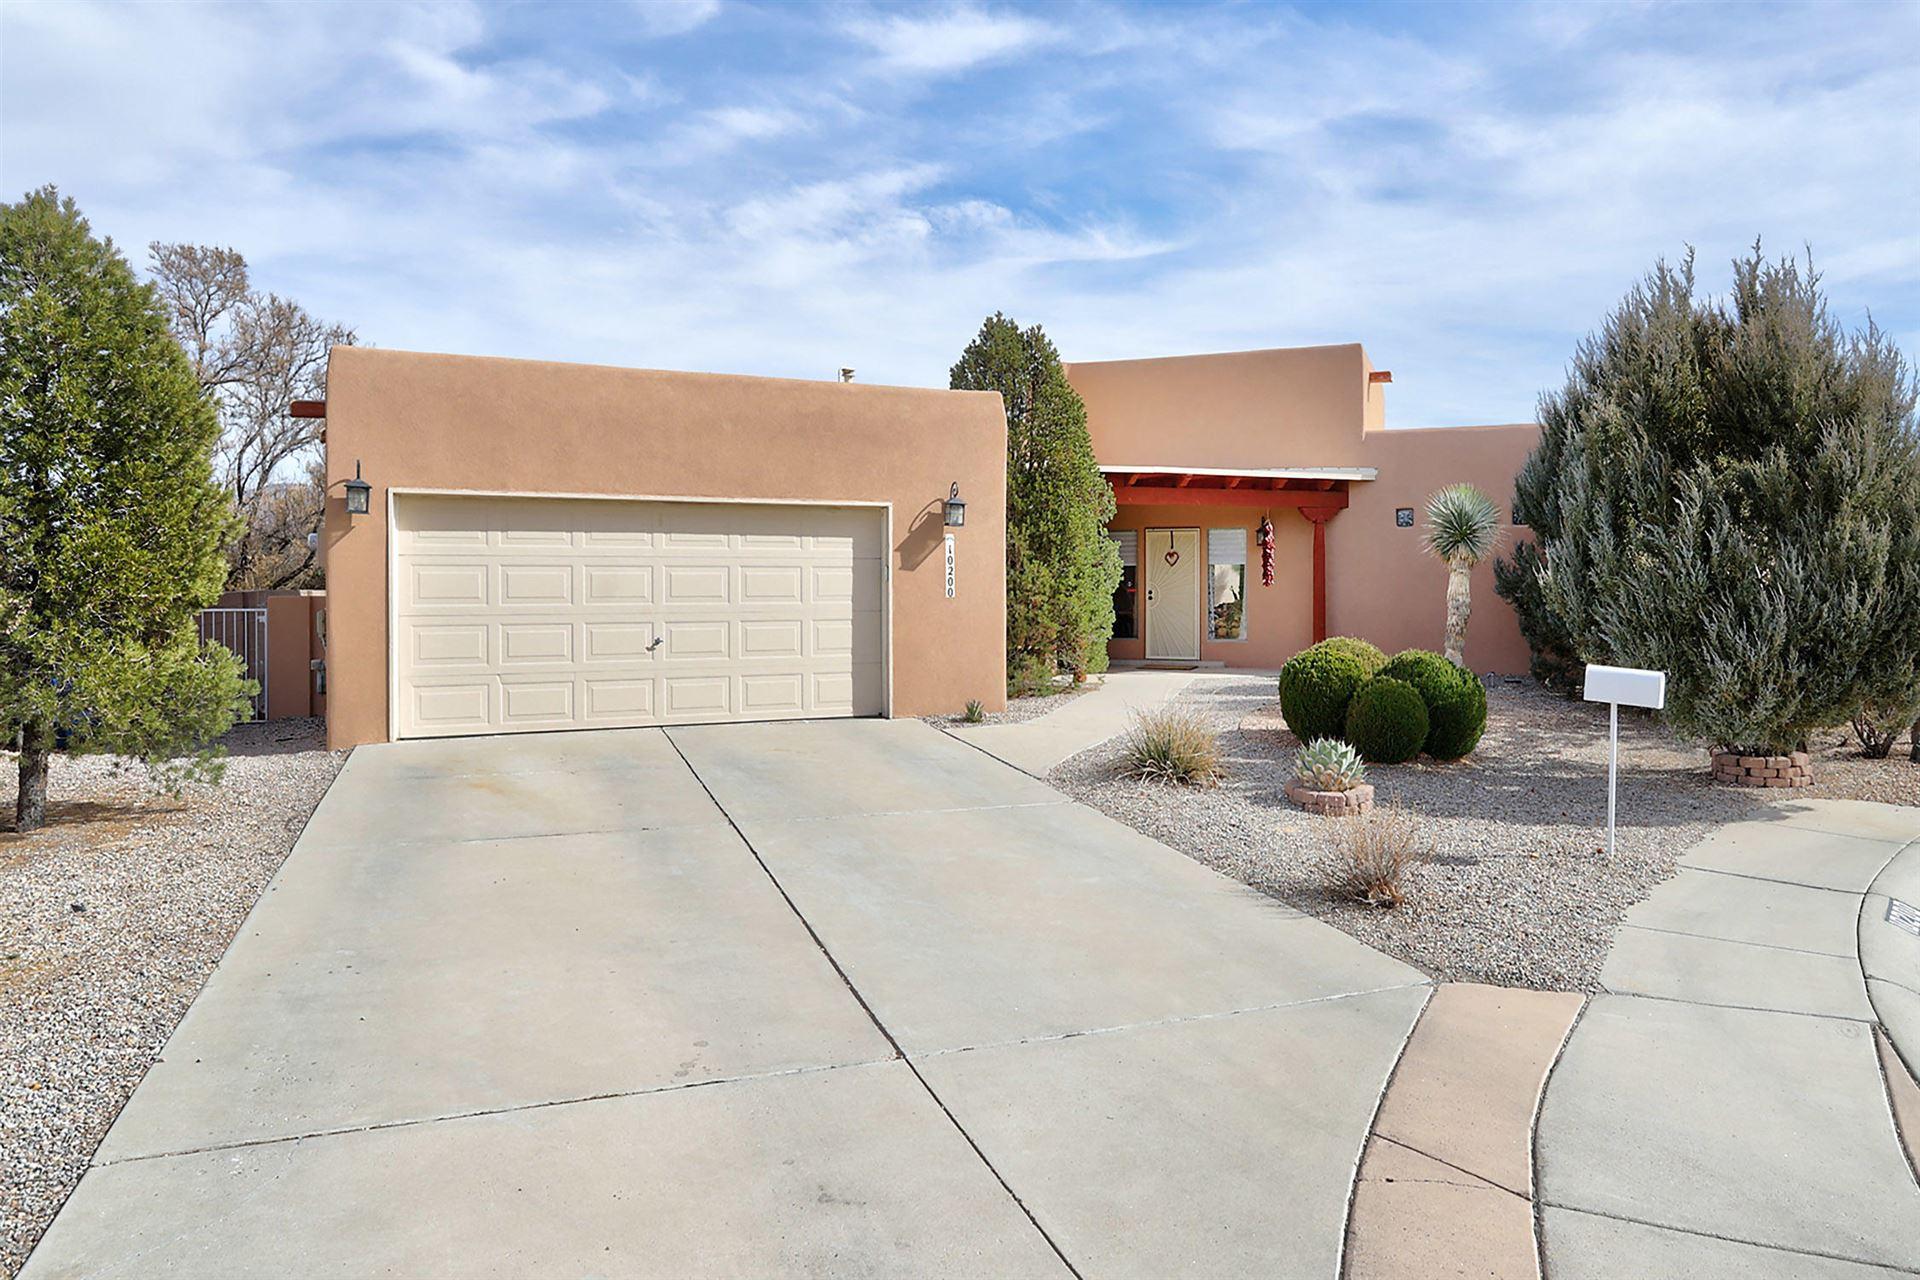 10200 SANDHURST Drive NW, Albuquerque, NM 87114 - MLS#: 985692